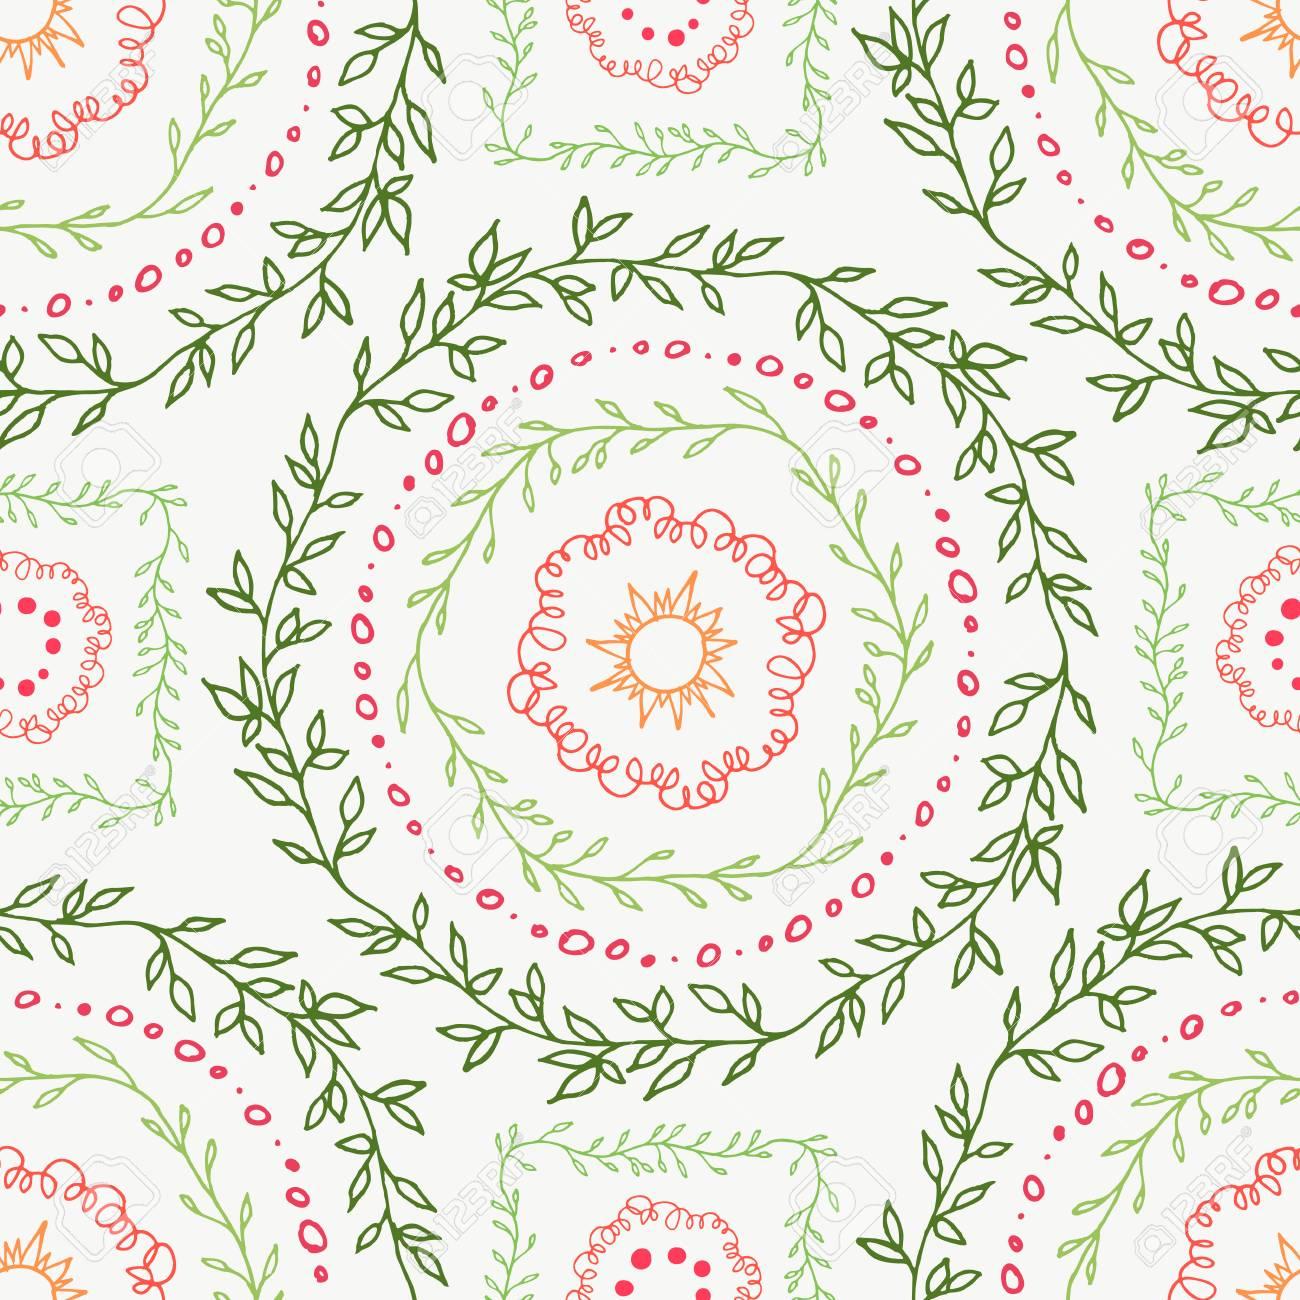 Decorative Boho Seamless Pattern Endless Print With Green Pink